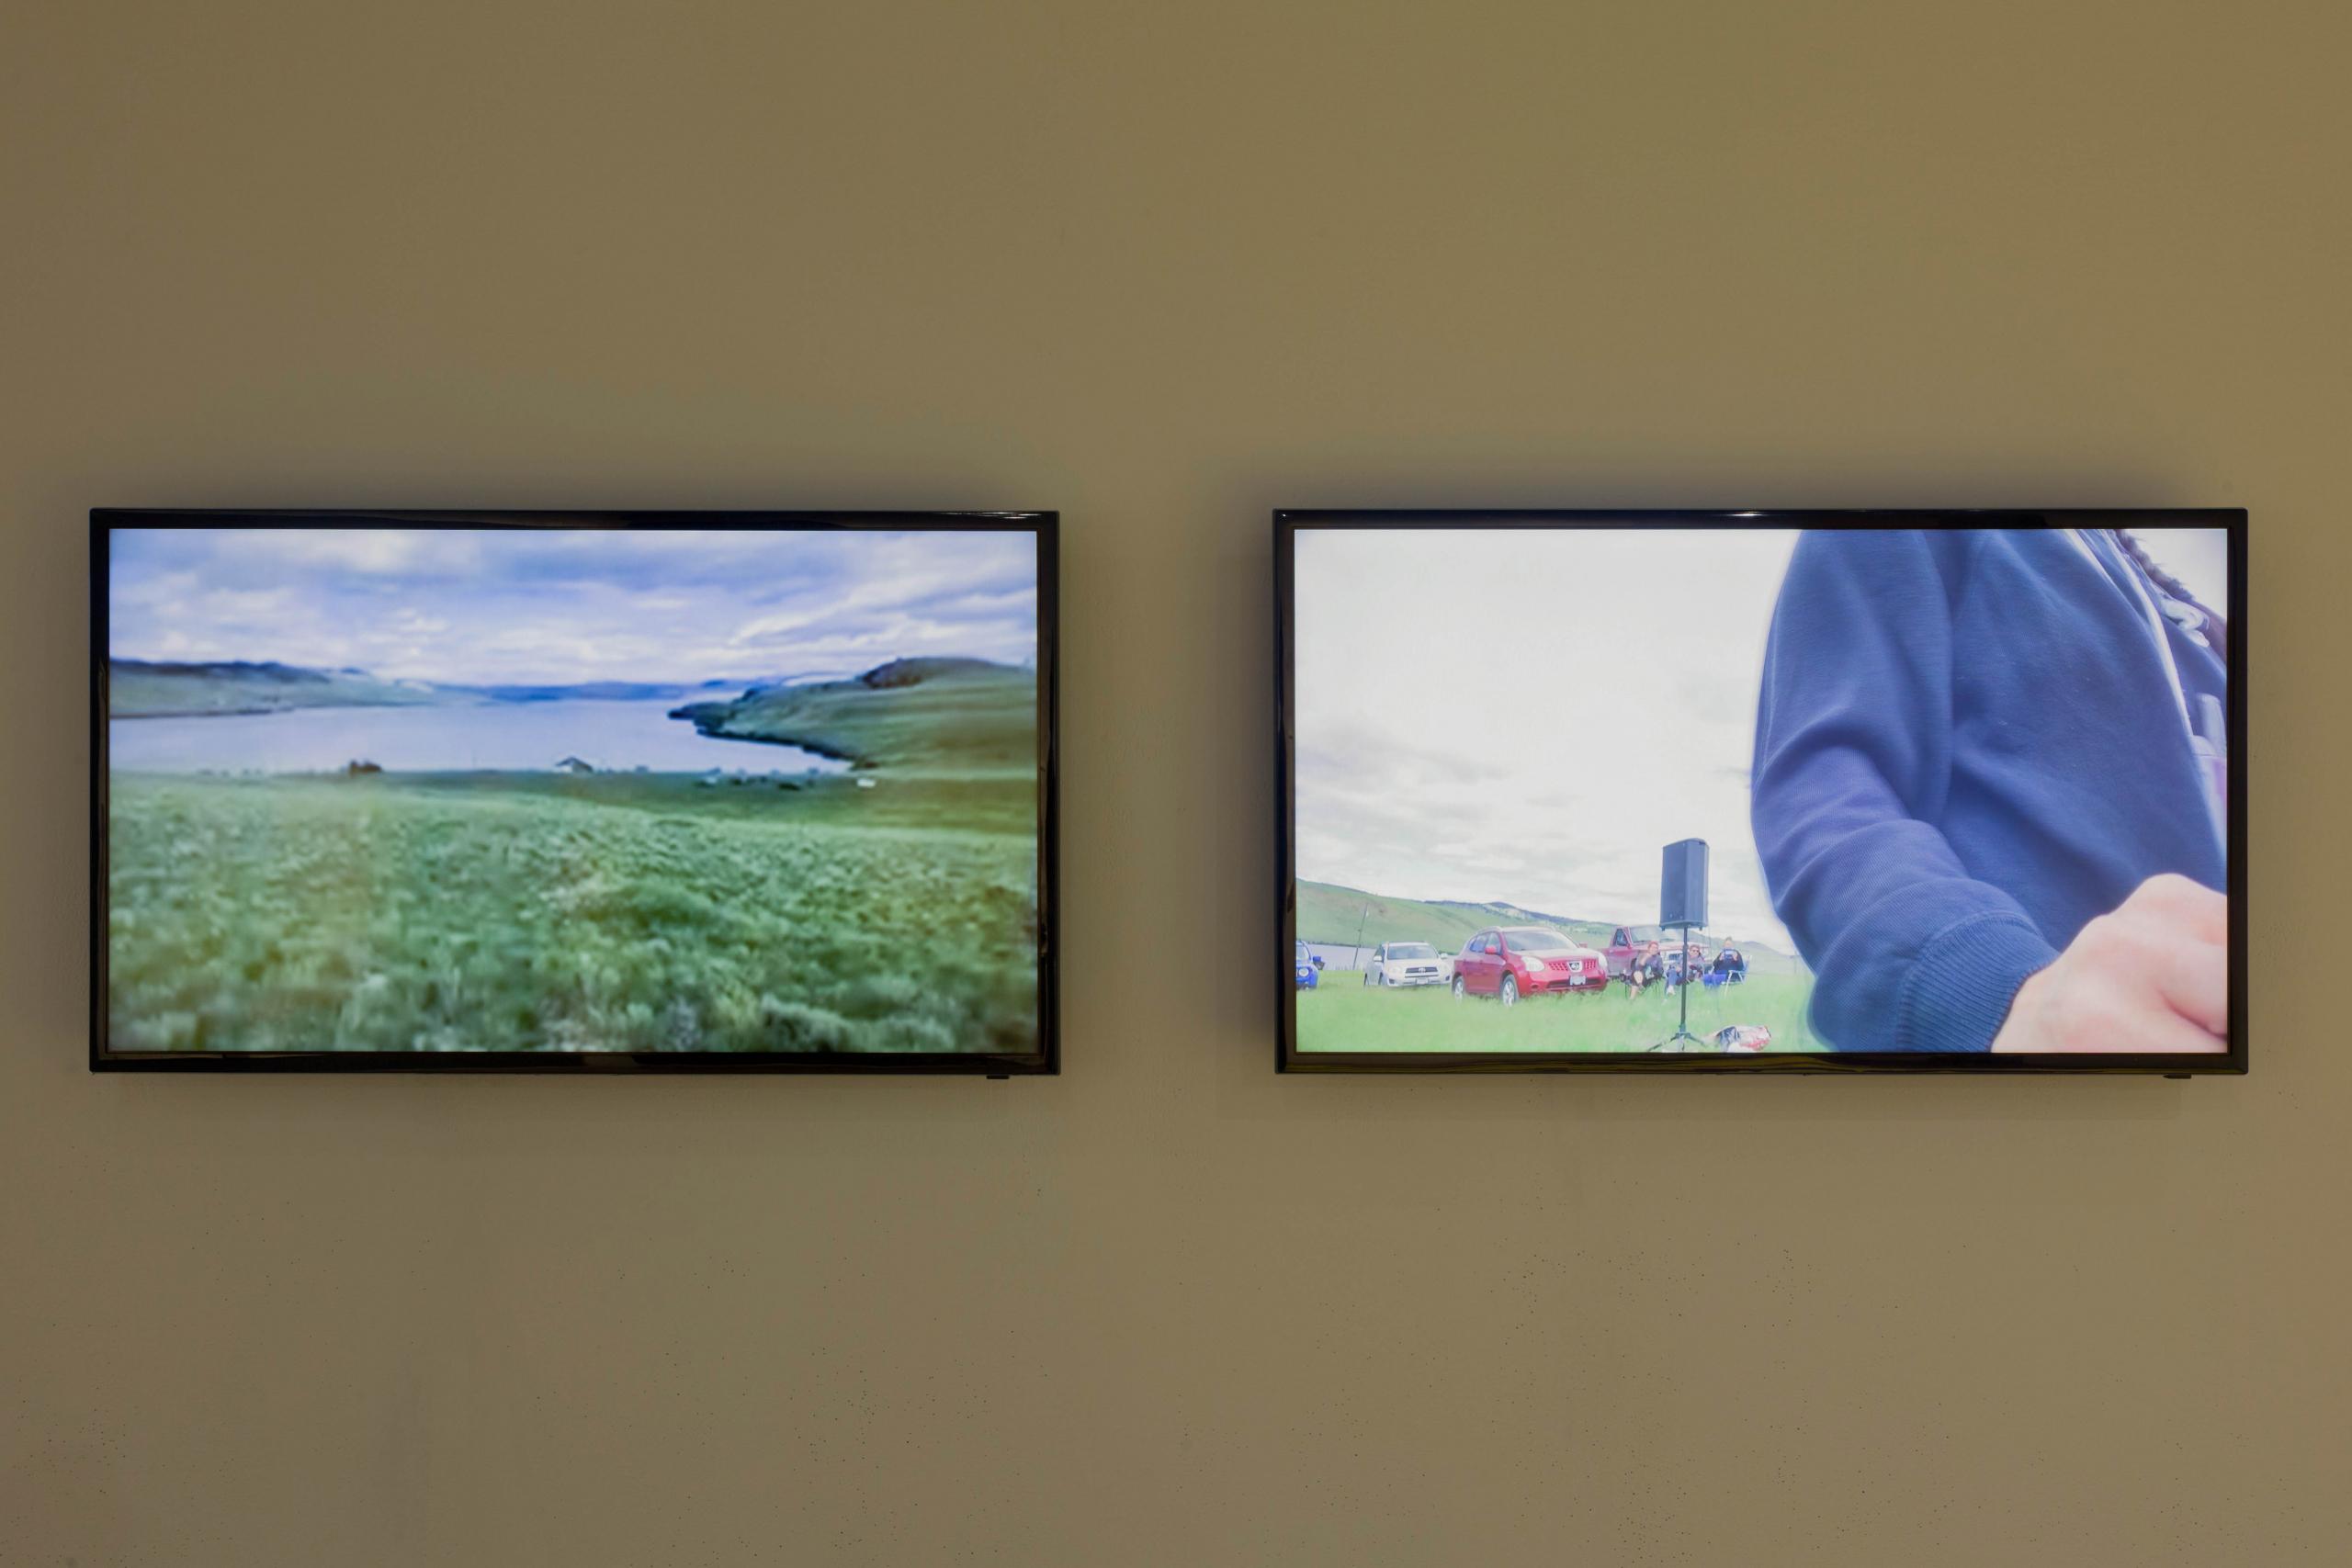 Installation view, Developing Historical Negatives, Photo: Darren Rigo.